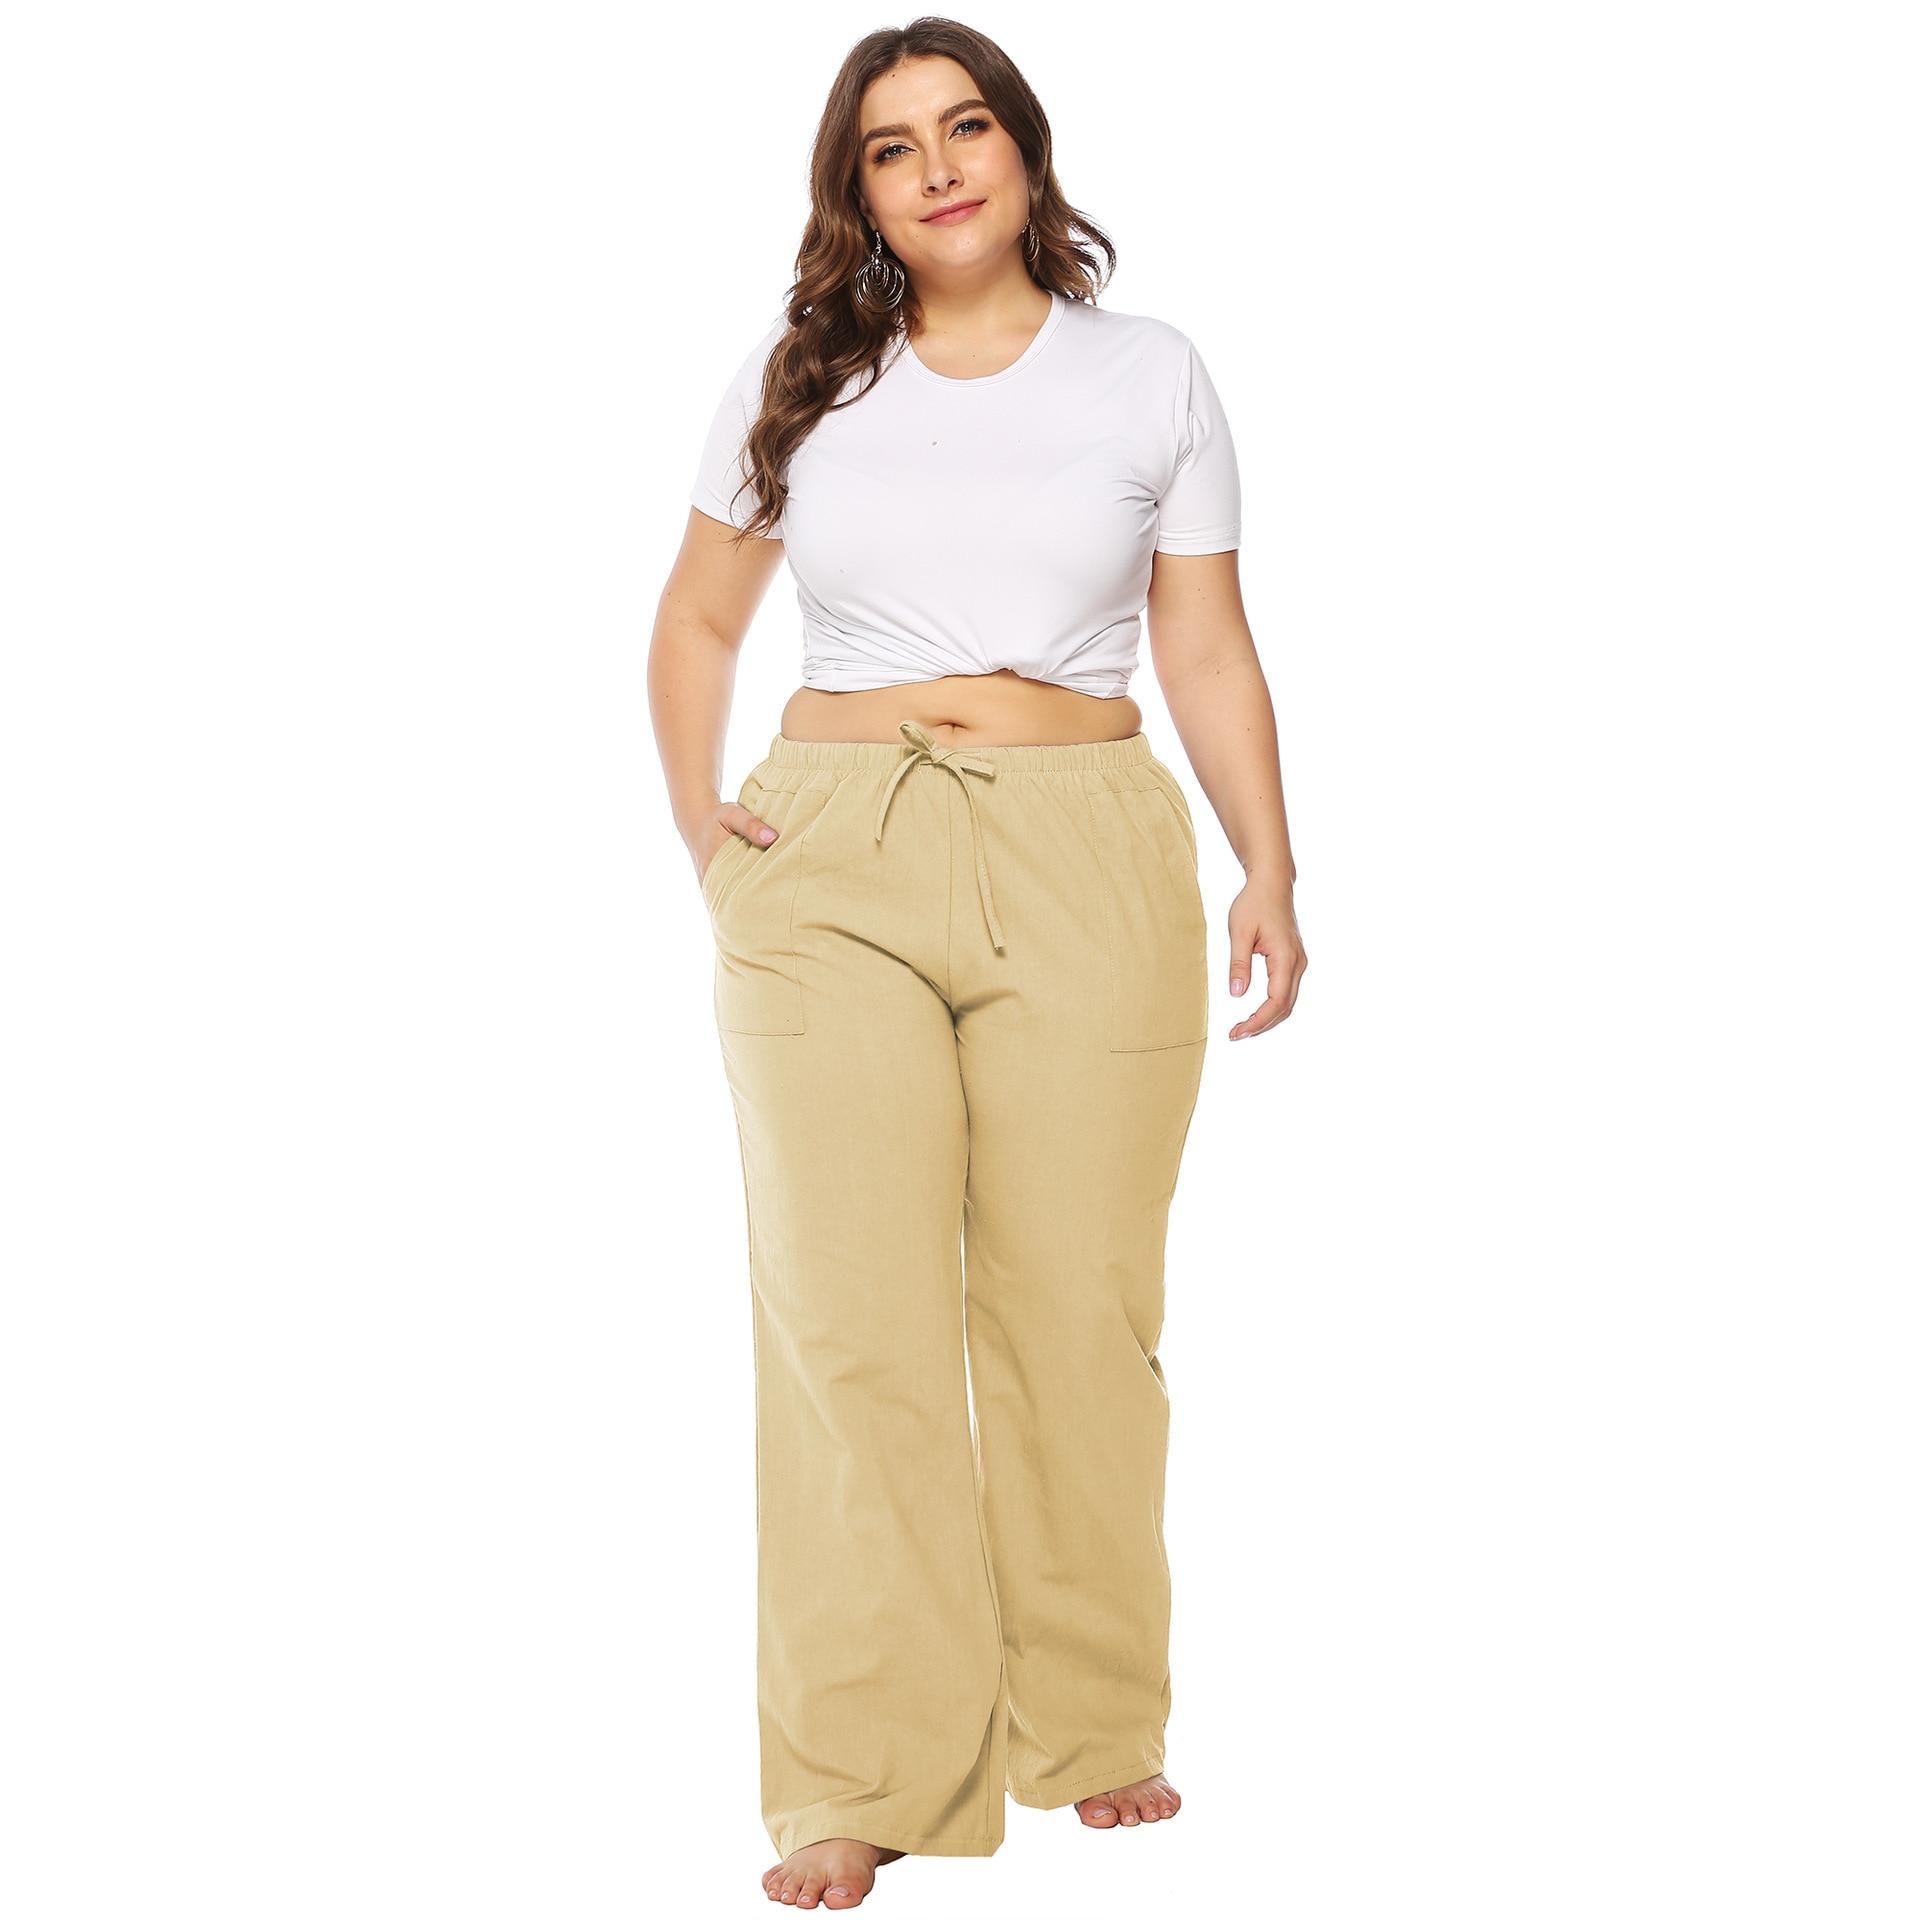 Women Summer Loose Flare Pants Girls Long Casual Pants Large Size 2xl Overalls Streetwear Trousers Female Hotsale Sweatpants